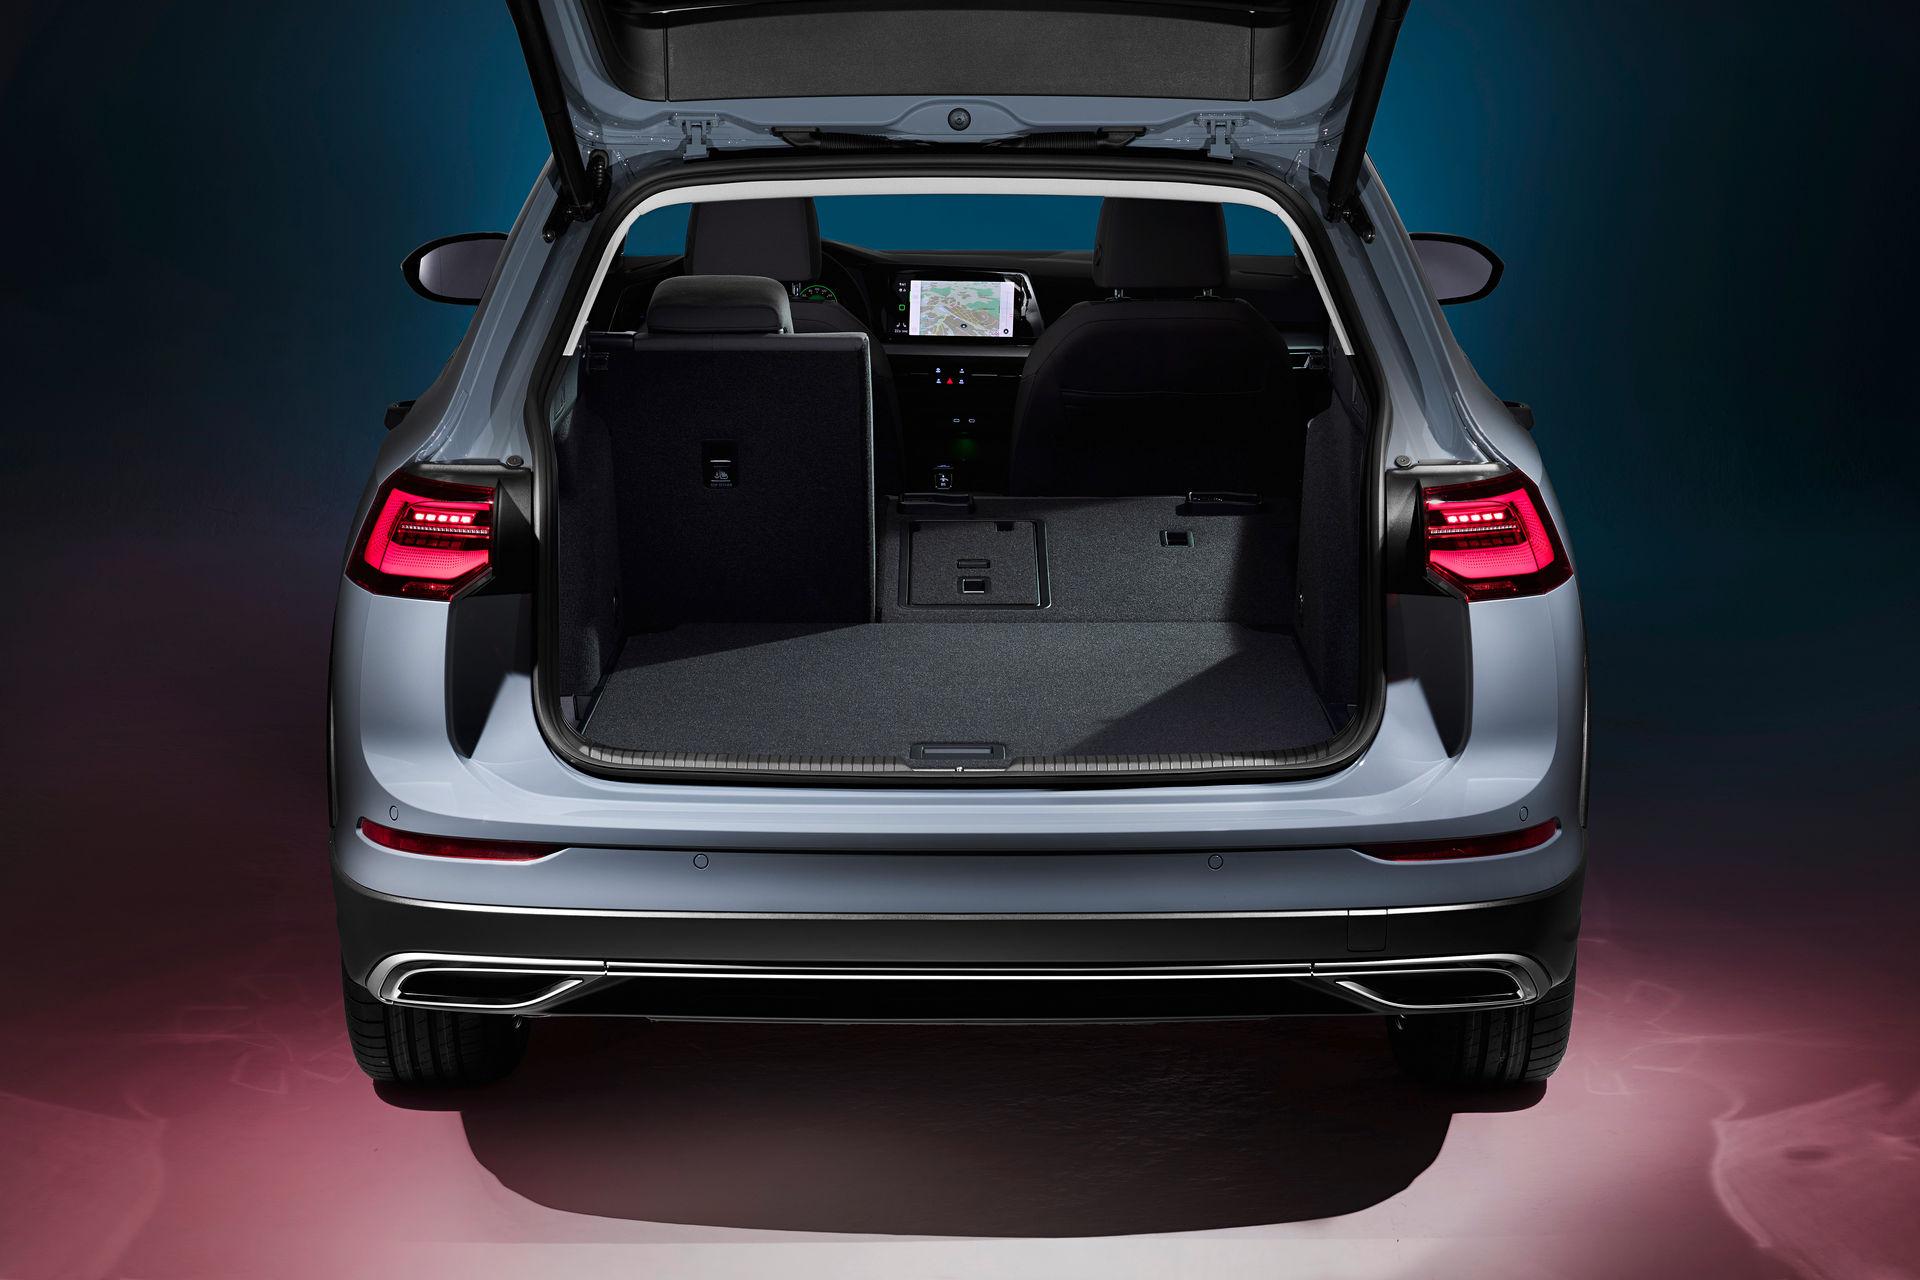 VW-Golf-Estate-And-Golf-Alltrack-9